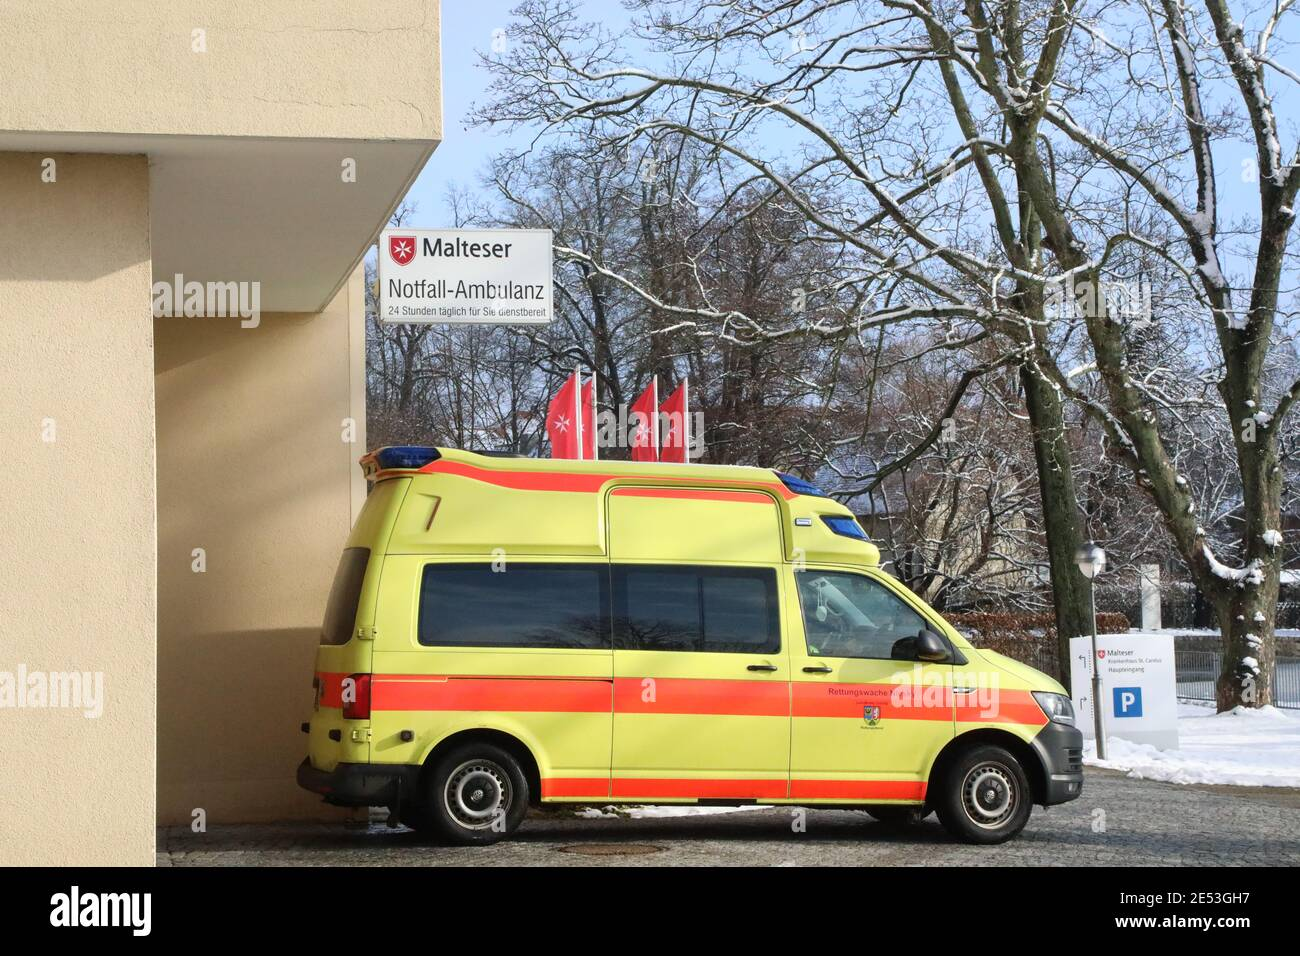 Malteser Krankenhaus St. Carolus in Görlitz, Notfall Ambulanz Stock Photo